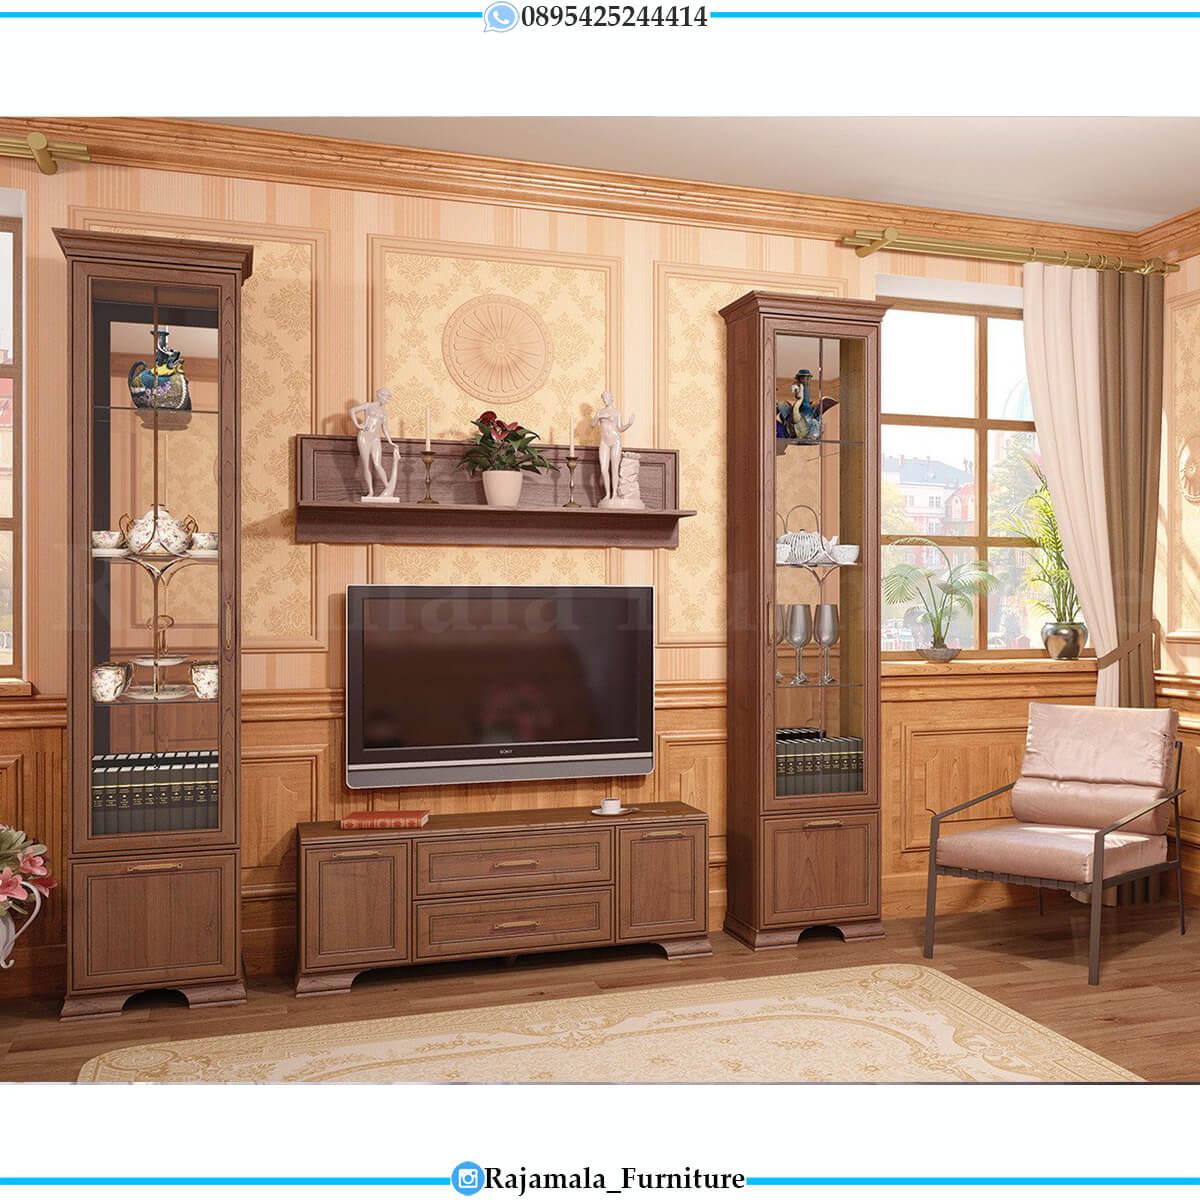 Bufet TV Jati Minimalis Natural Classic Luxury Color RM-0658